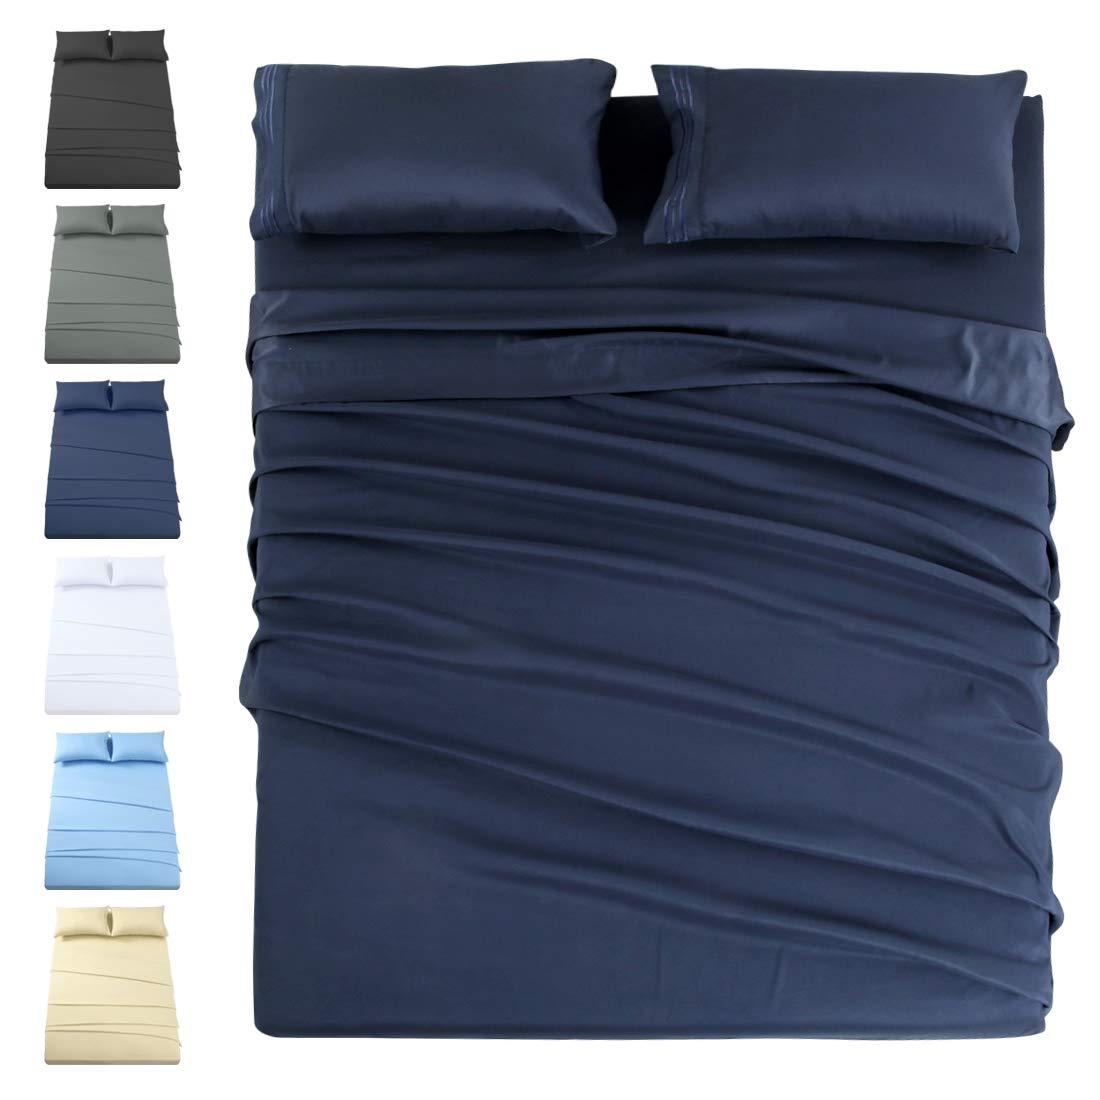 INGALIK Premium Bed Sheet Set 3 Piece 120 GSM Brushed Microfiber,1800 Series Hotel Luxury Bedding Sheets,Ultra Soft,Comfy,Fade Resistant,No Shrinkage,Hypoallergenic,Deep Pocket(Navy,Twin XL)